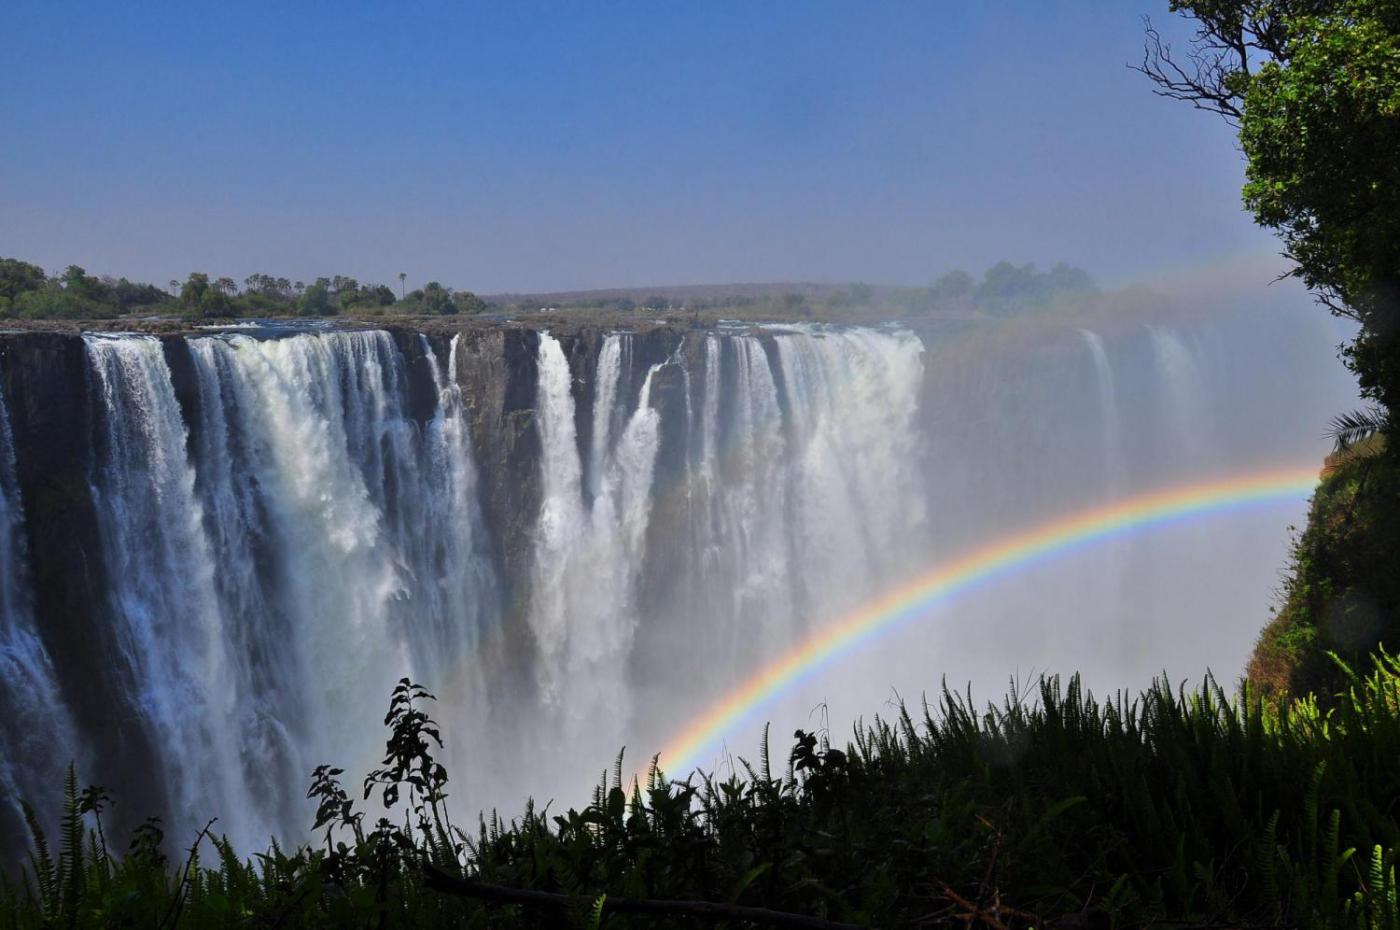 Symphony of the falls